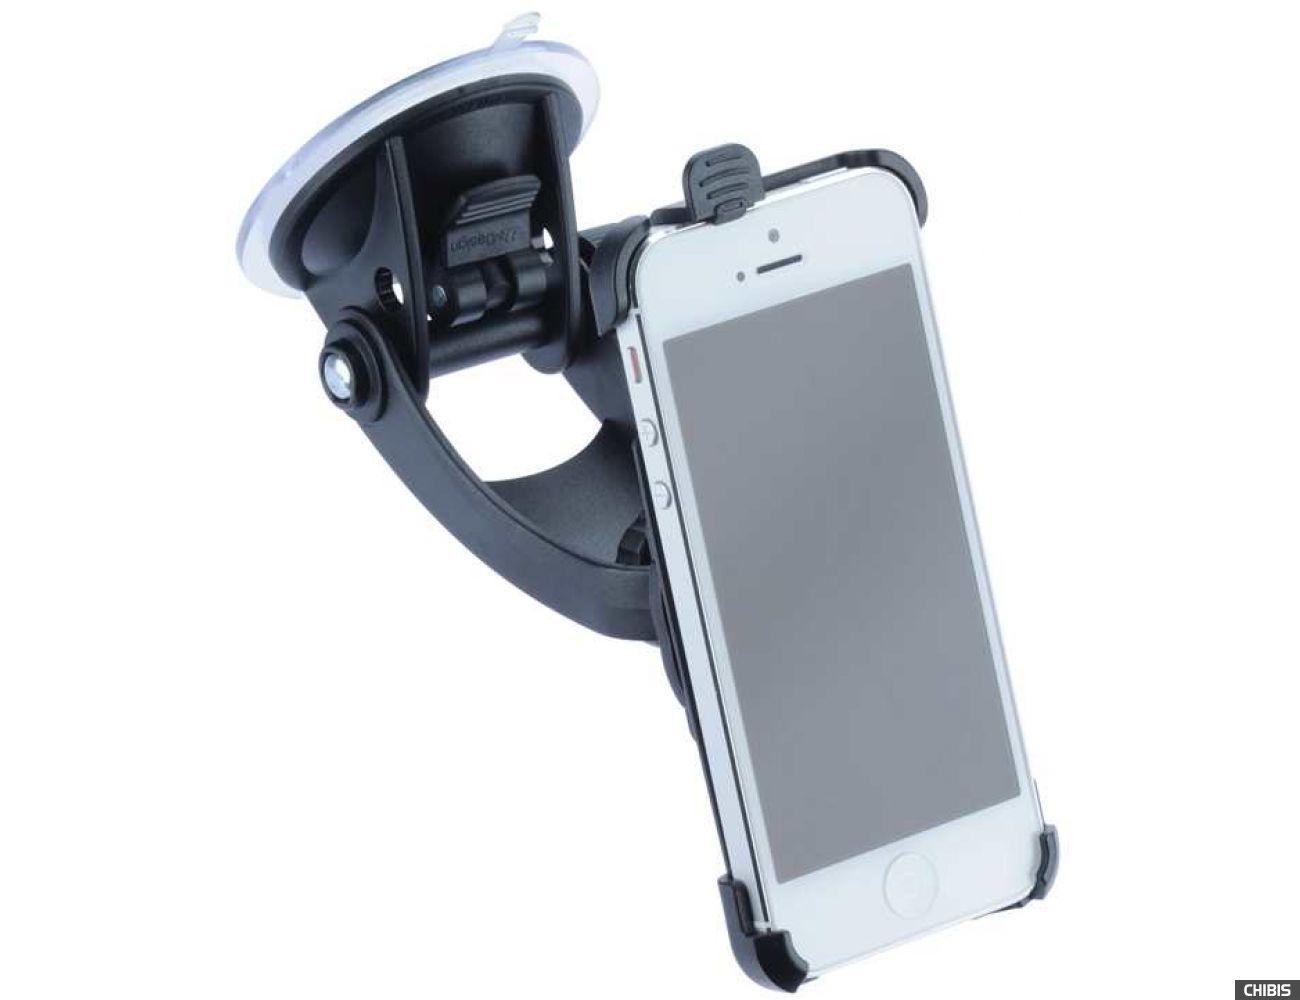 Автодержатель на стекло и торпедо iGrip Travaler kit (T5-94800) для Apple iPhone 5